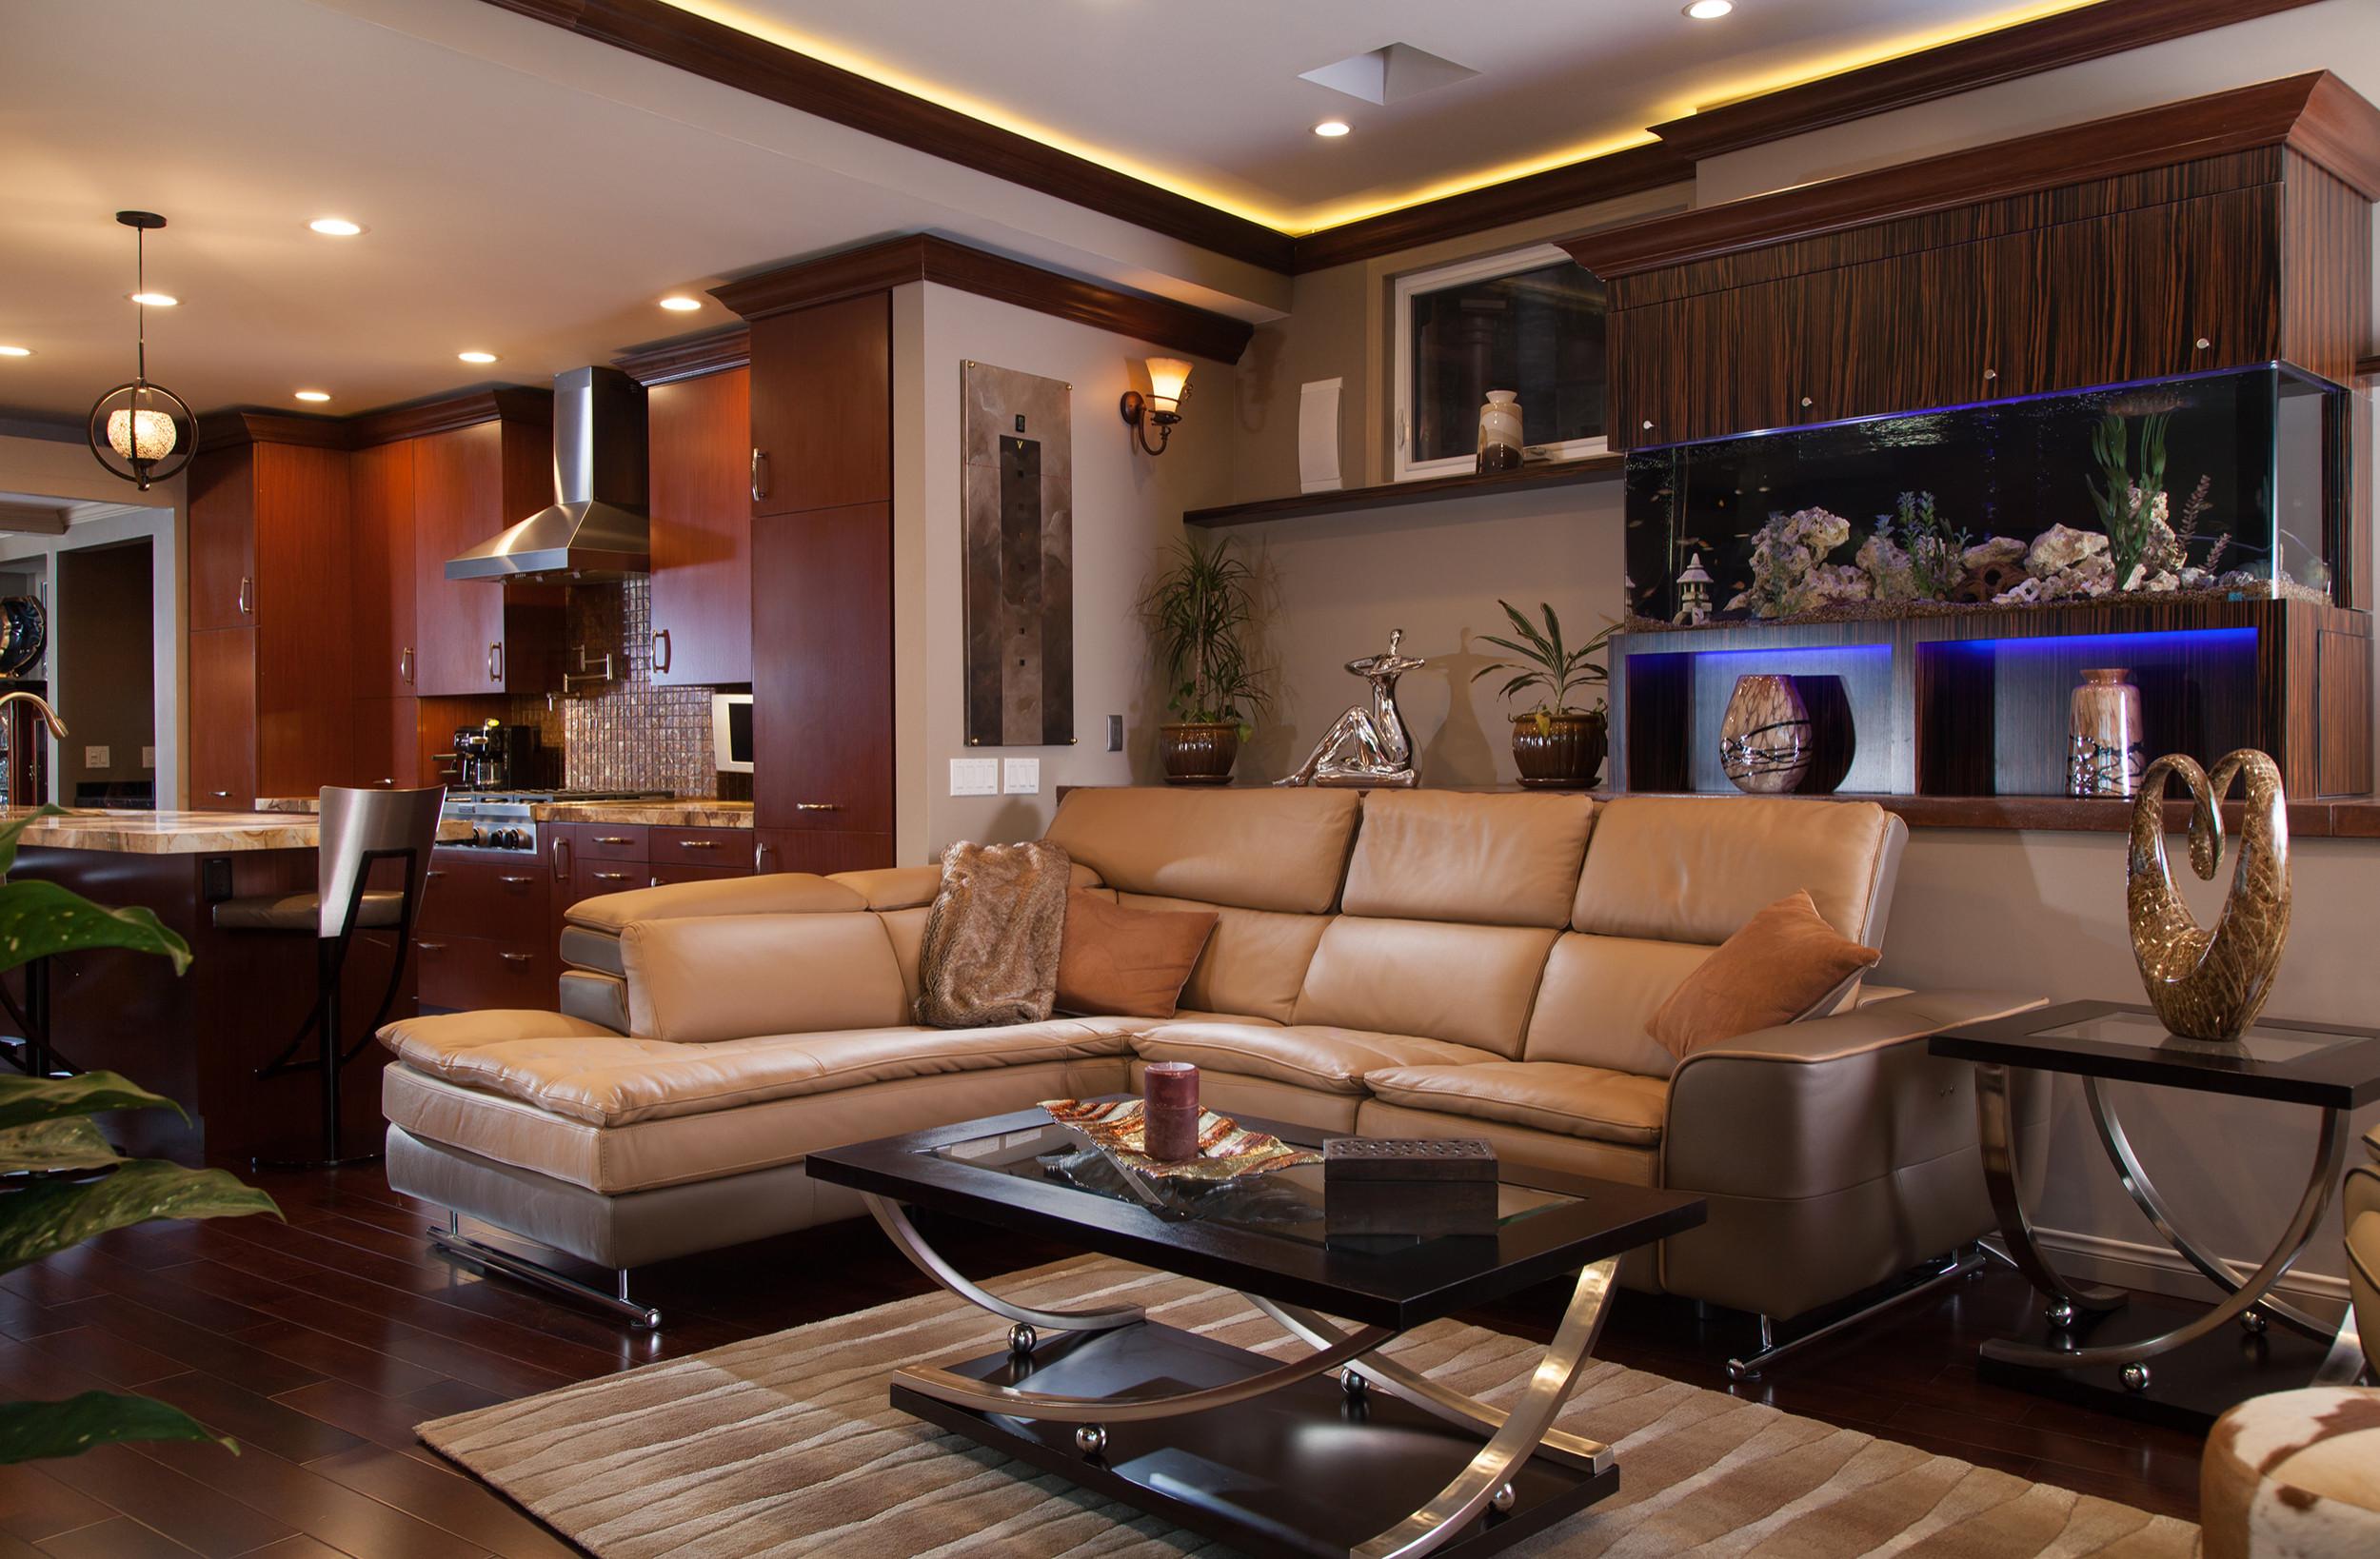 Laguna Beach Room Addition and Kitchen relocation